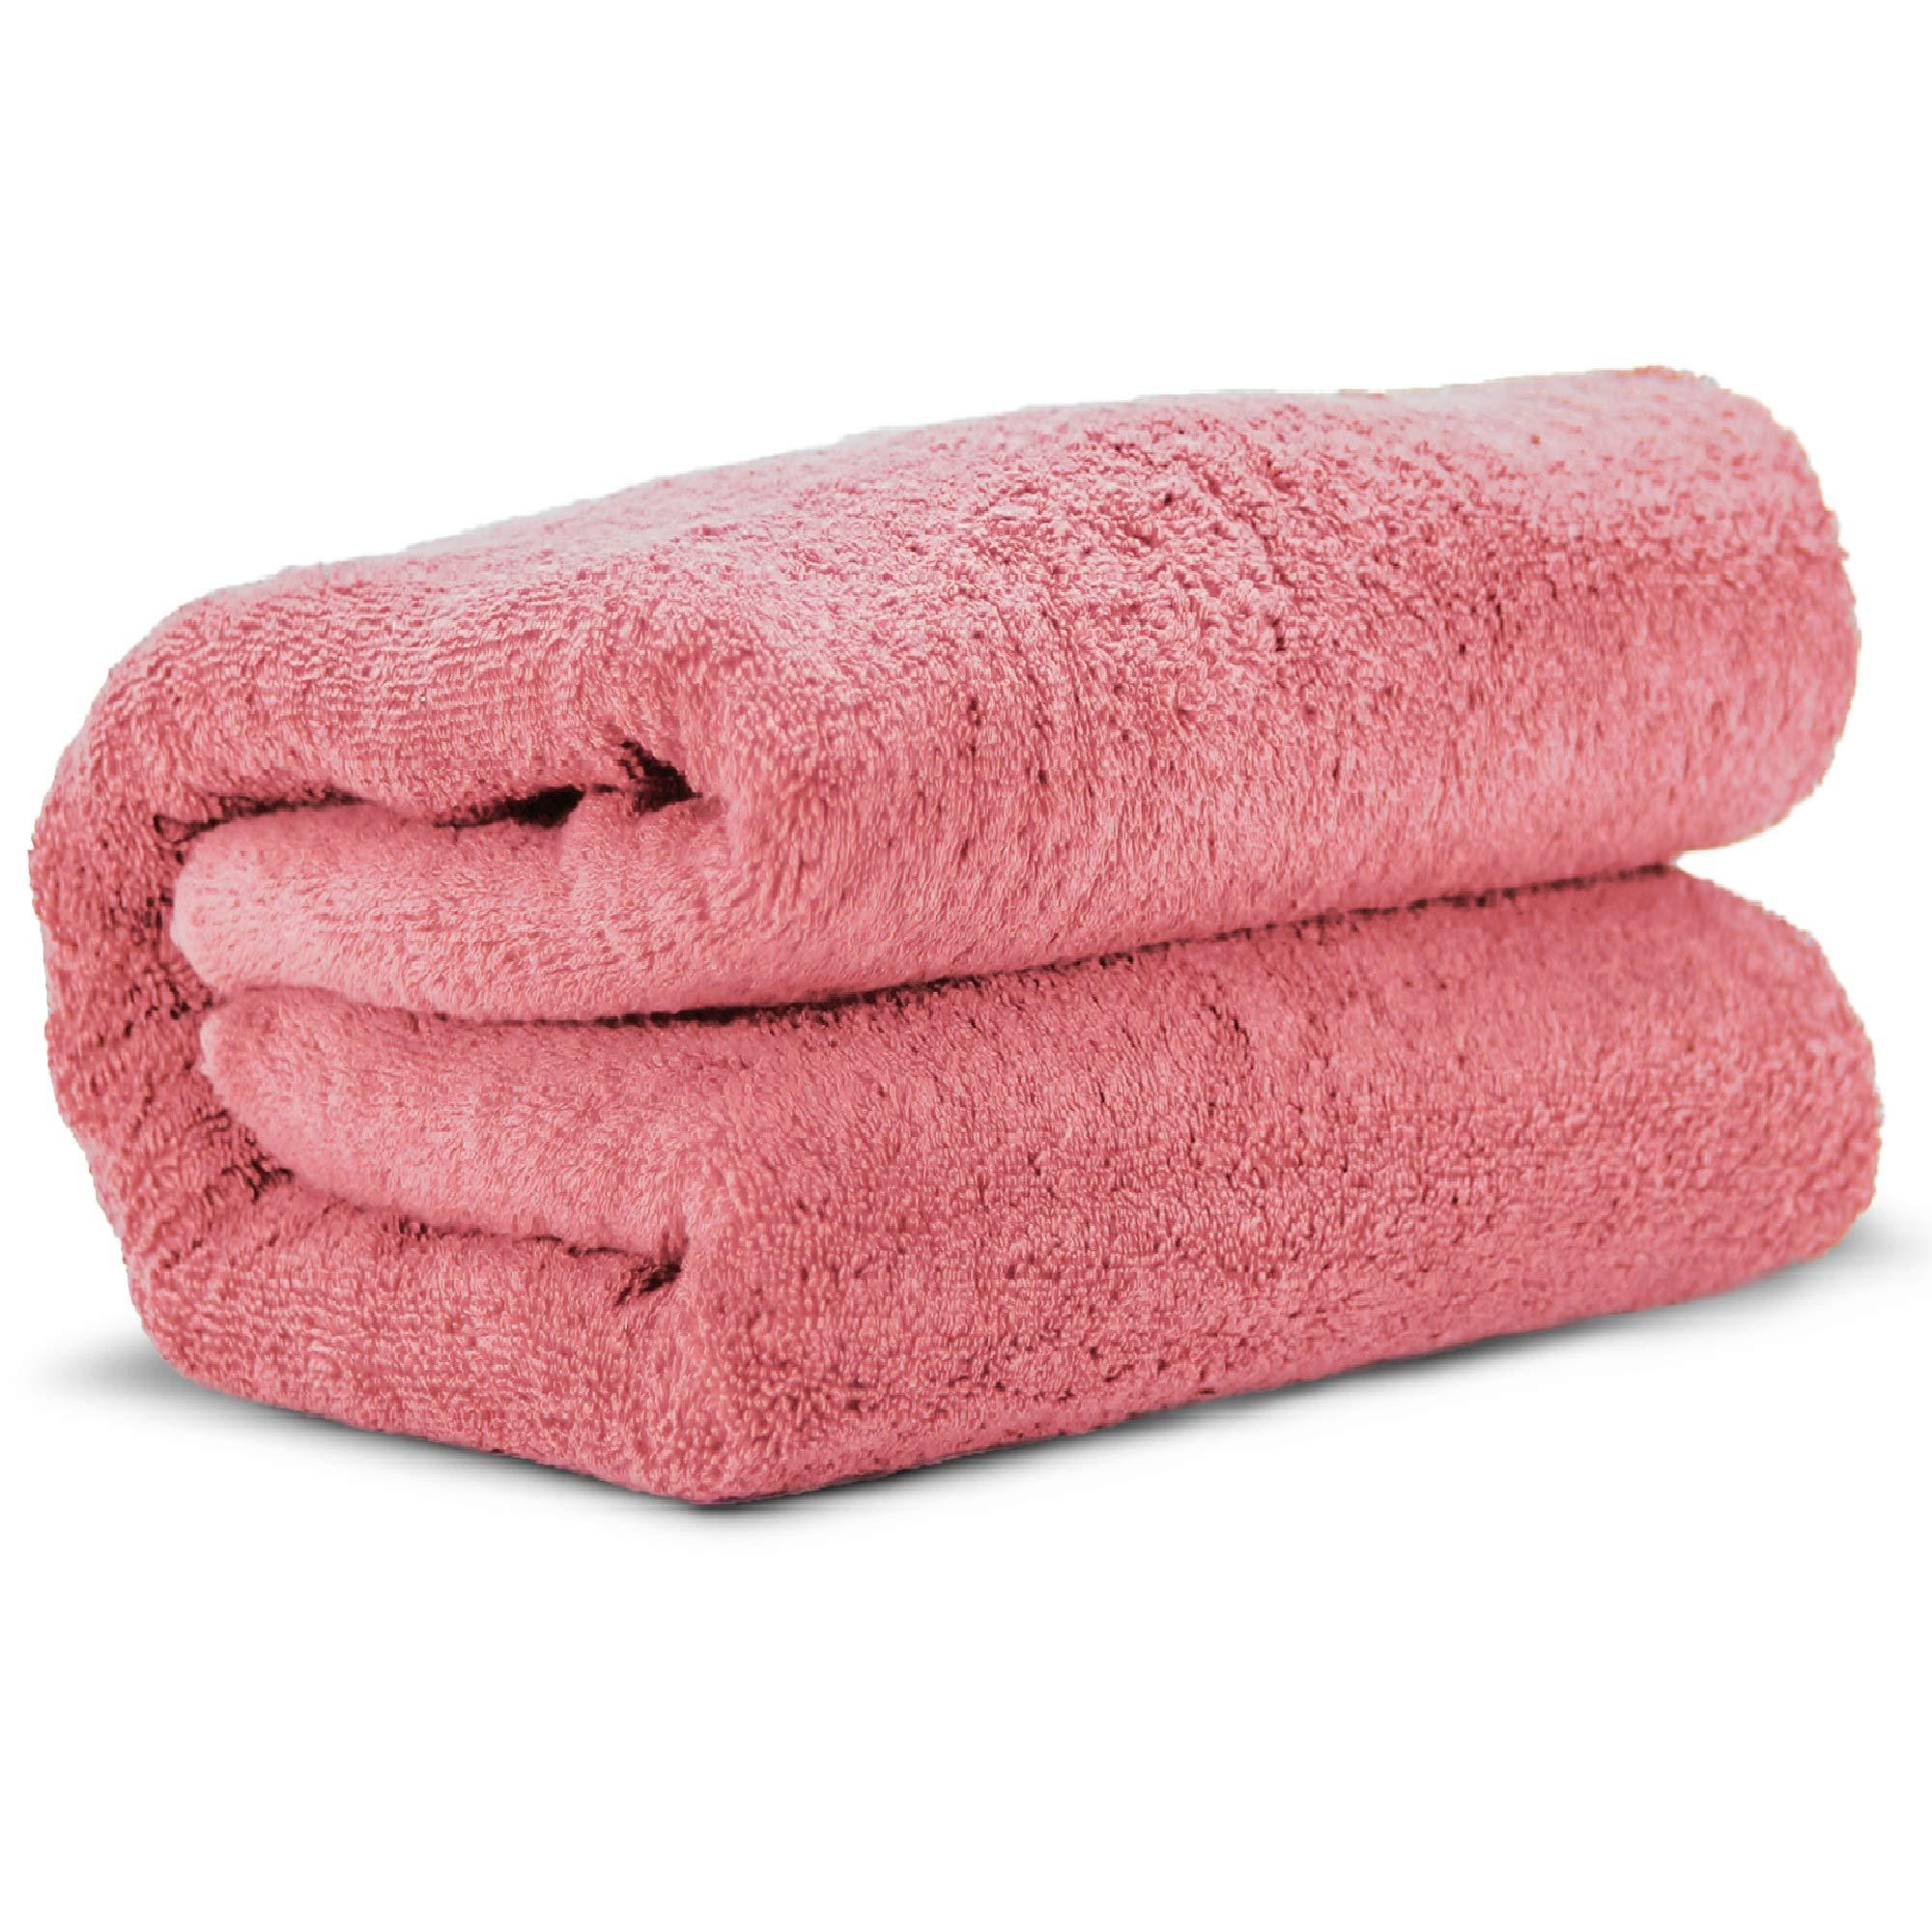 Towel Bazaar 100% Turkish Cotton Multipurpose Towels-Large Bath Sheet/Beach Towel/Bath Towel, Eco-Friendly (Oversized 40x80 inches, Pink)